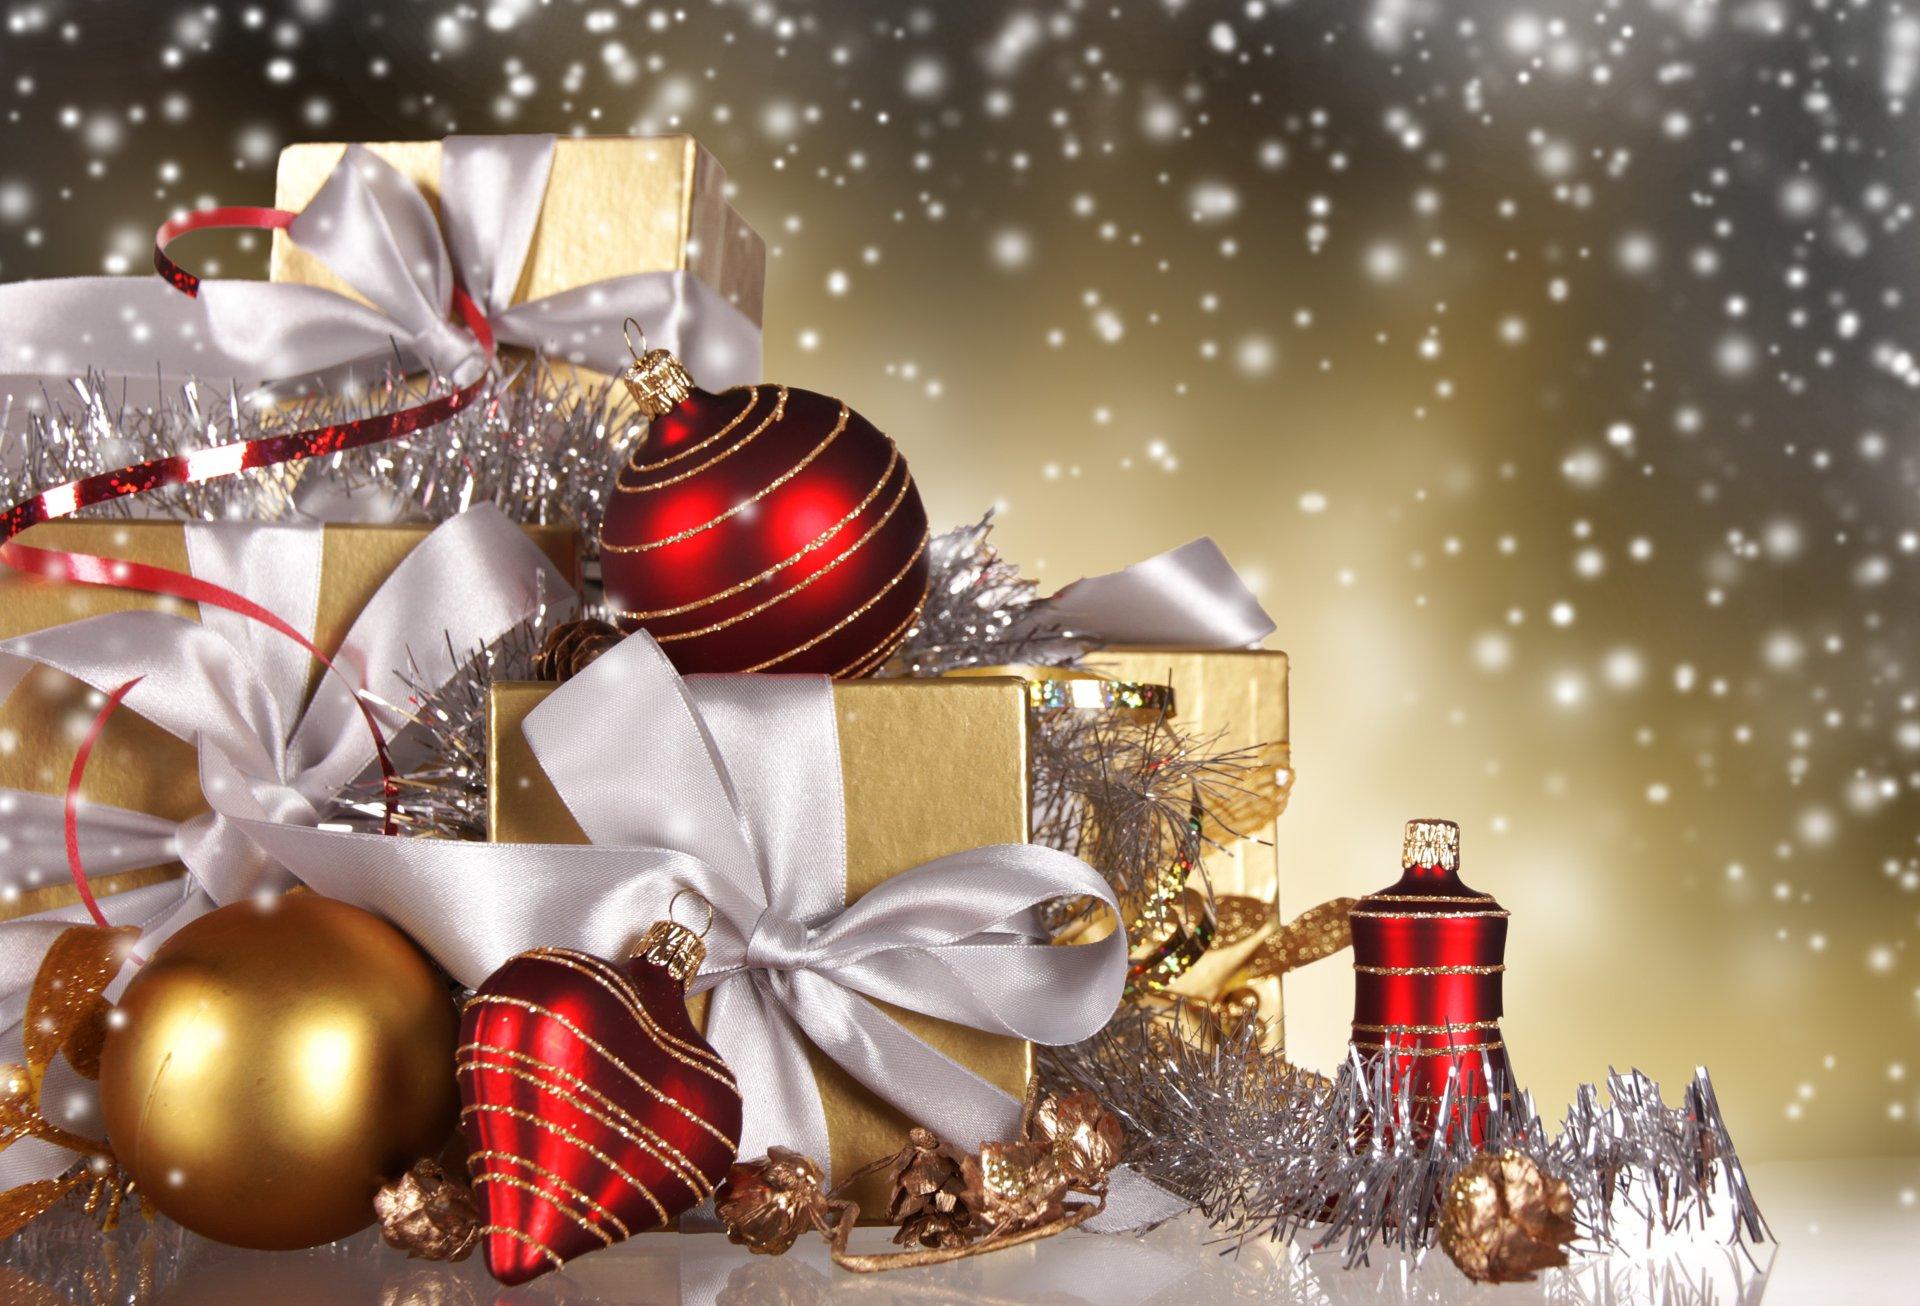 beautiful gifts Christmas Wallpaper 4K